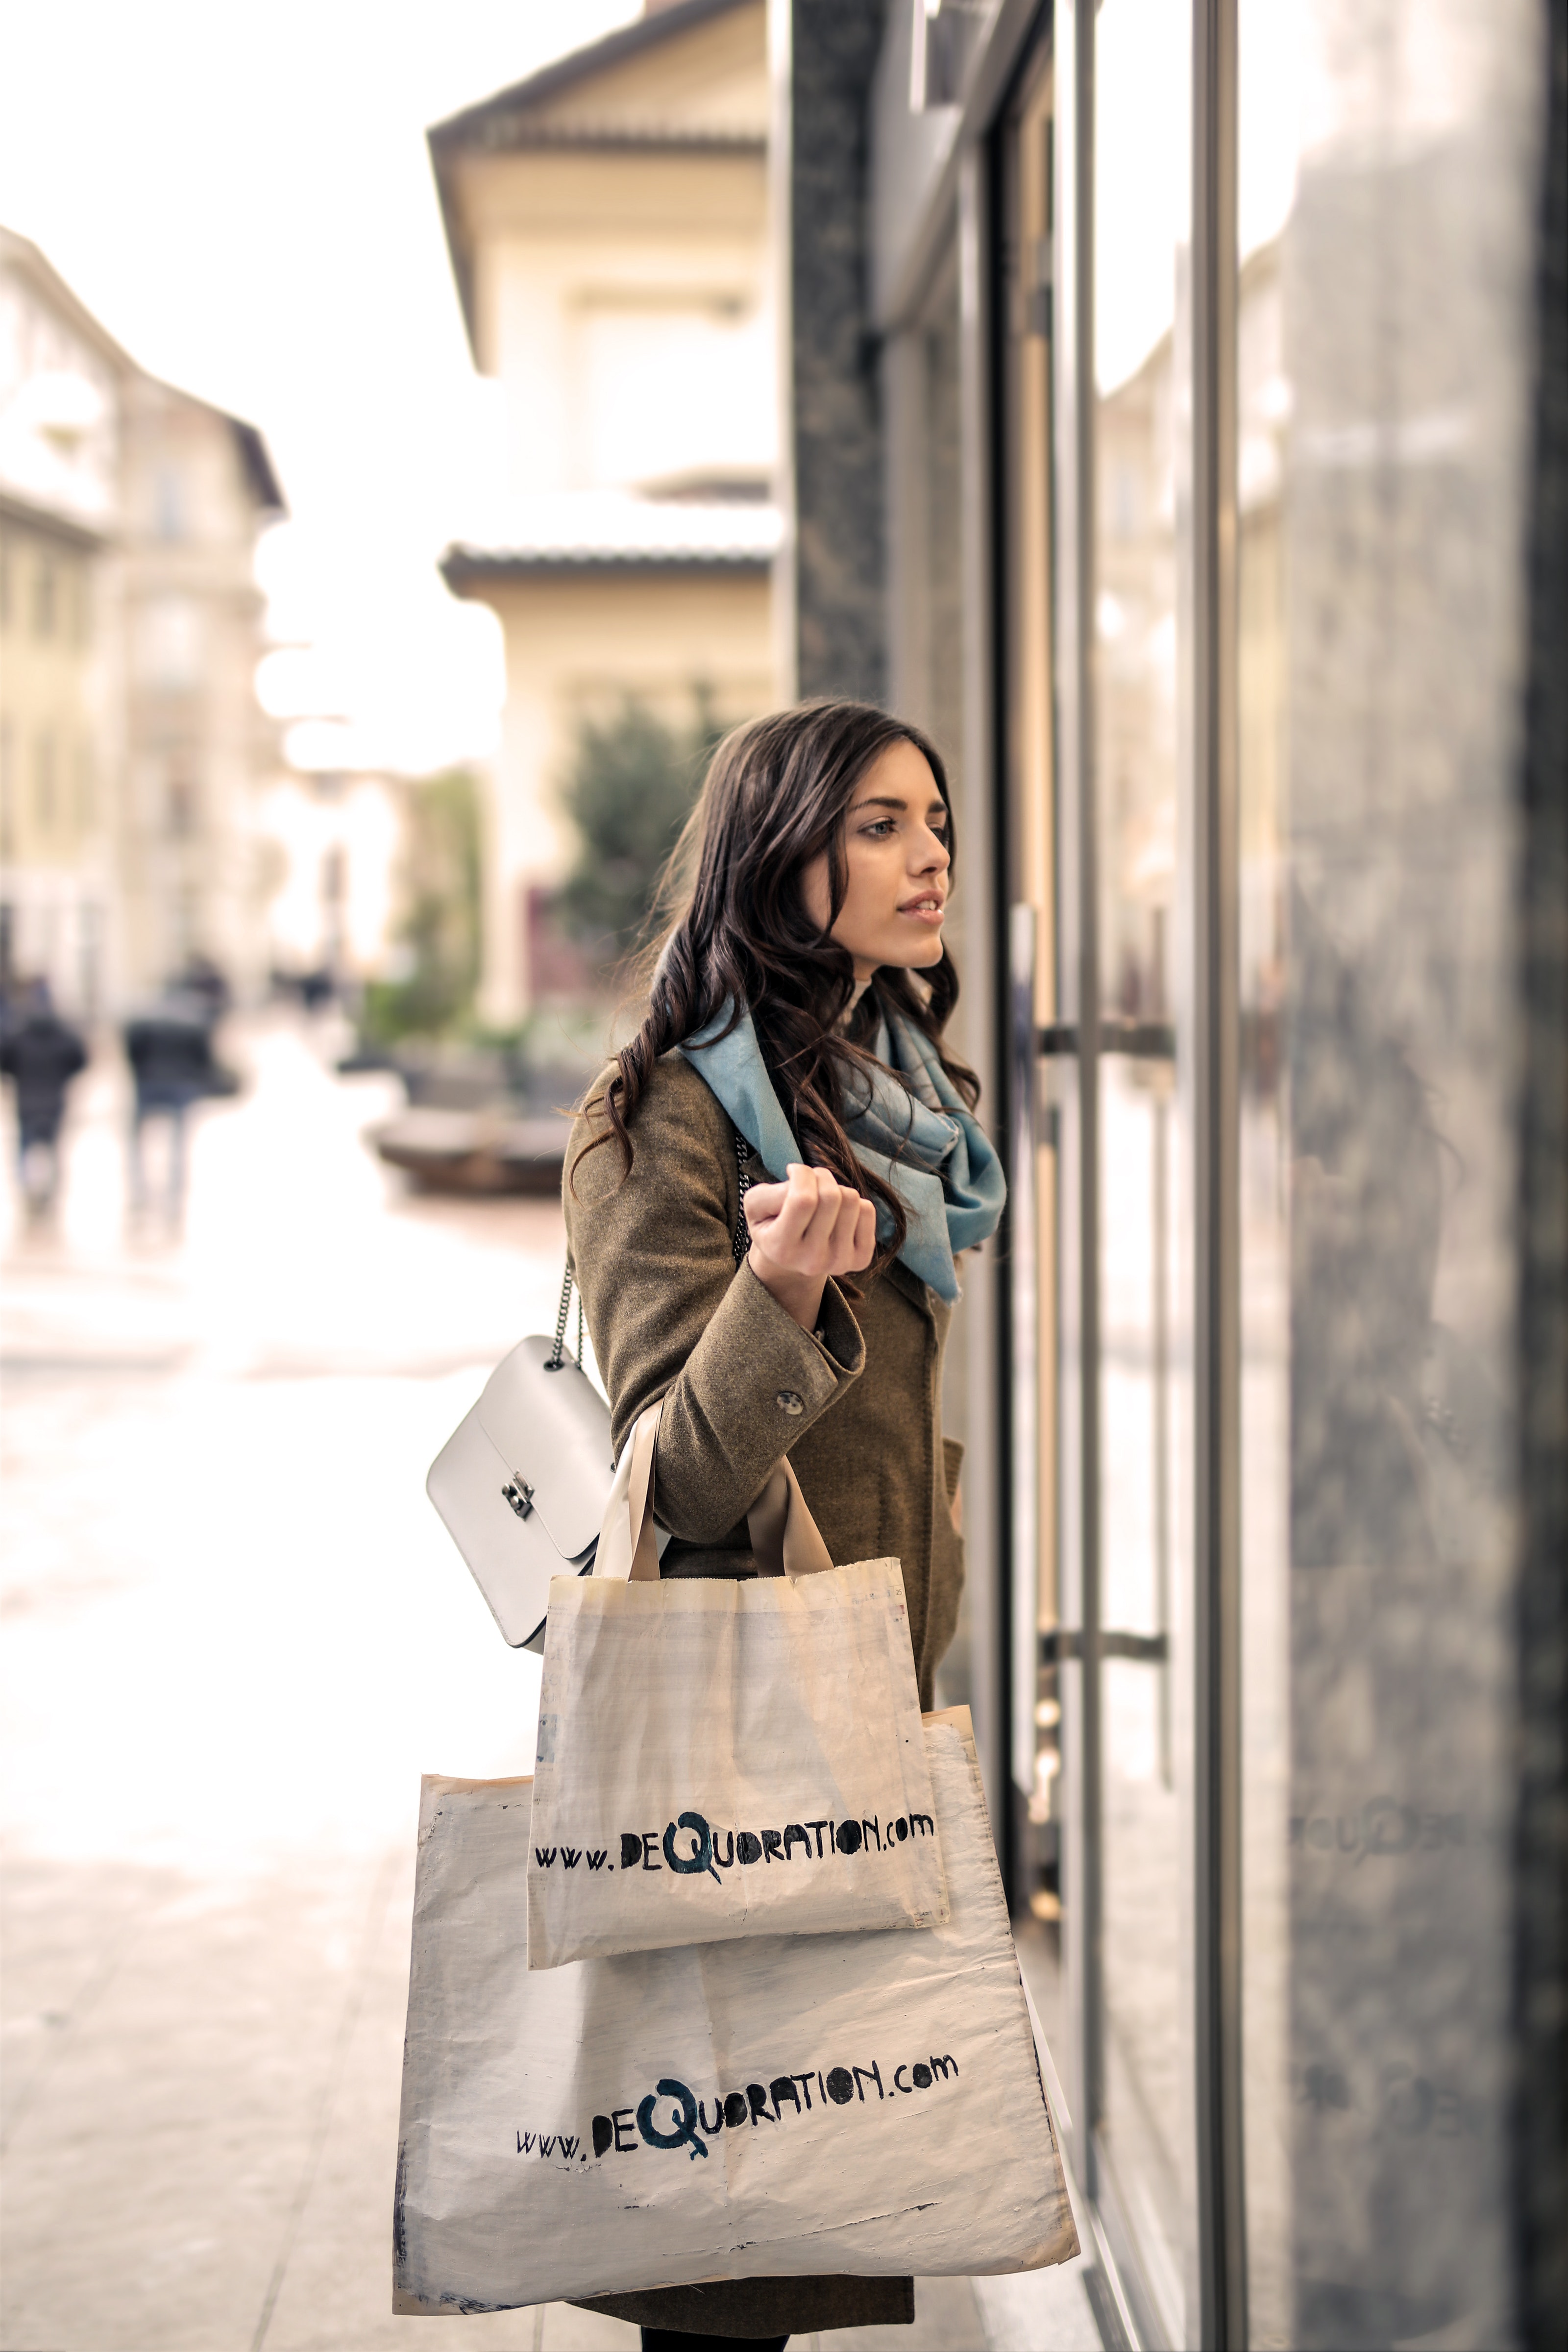 Woman wearing gray coat photo